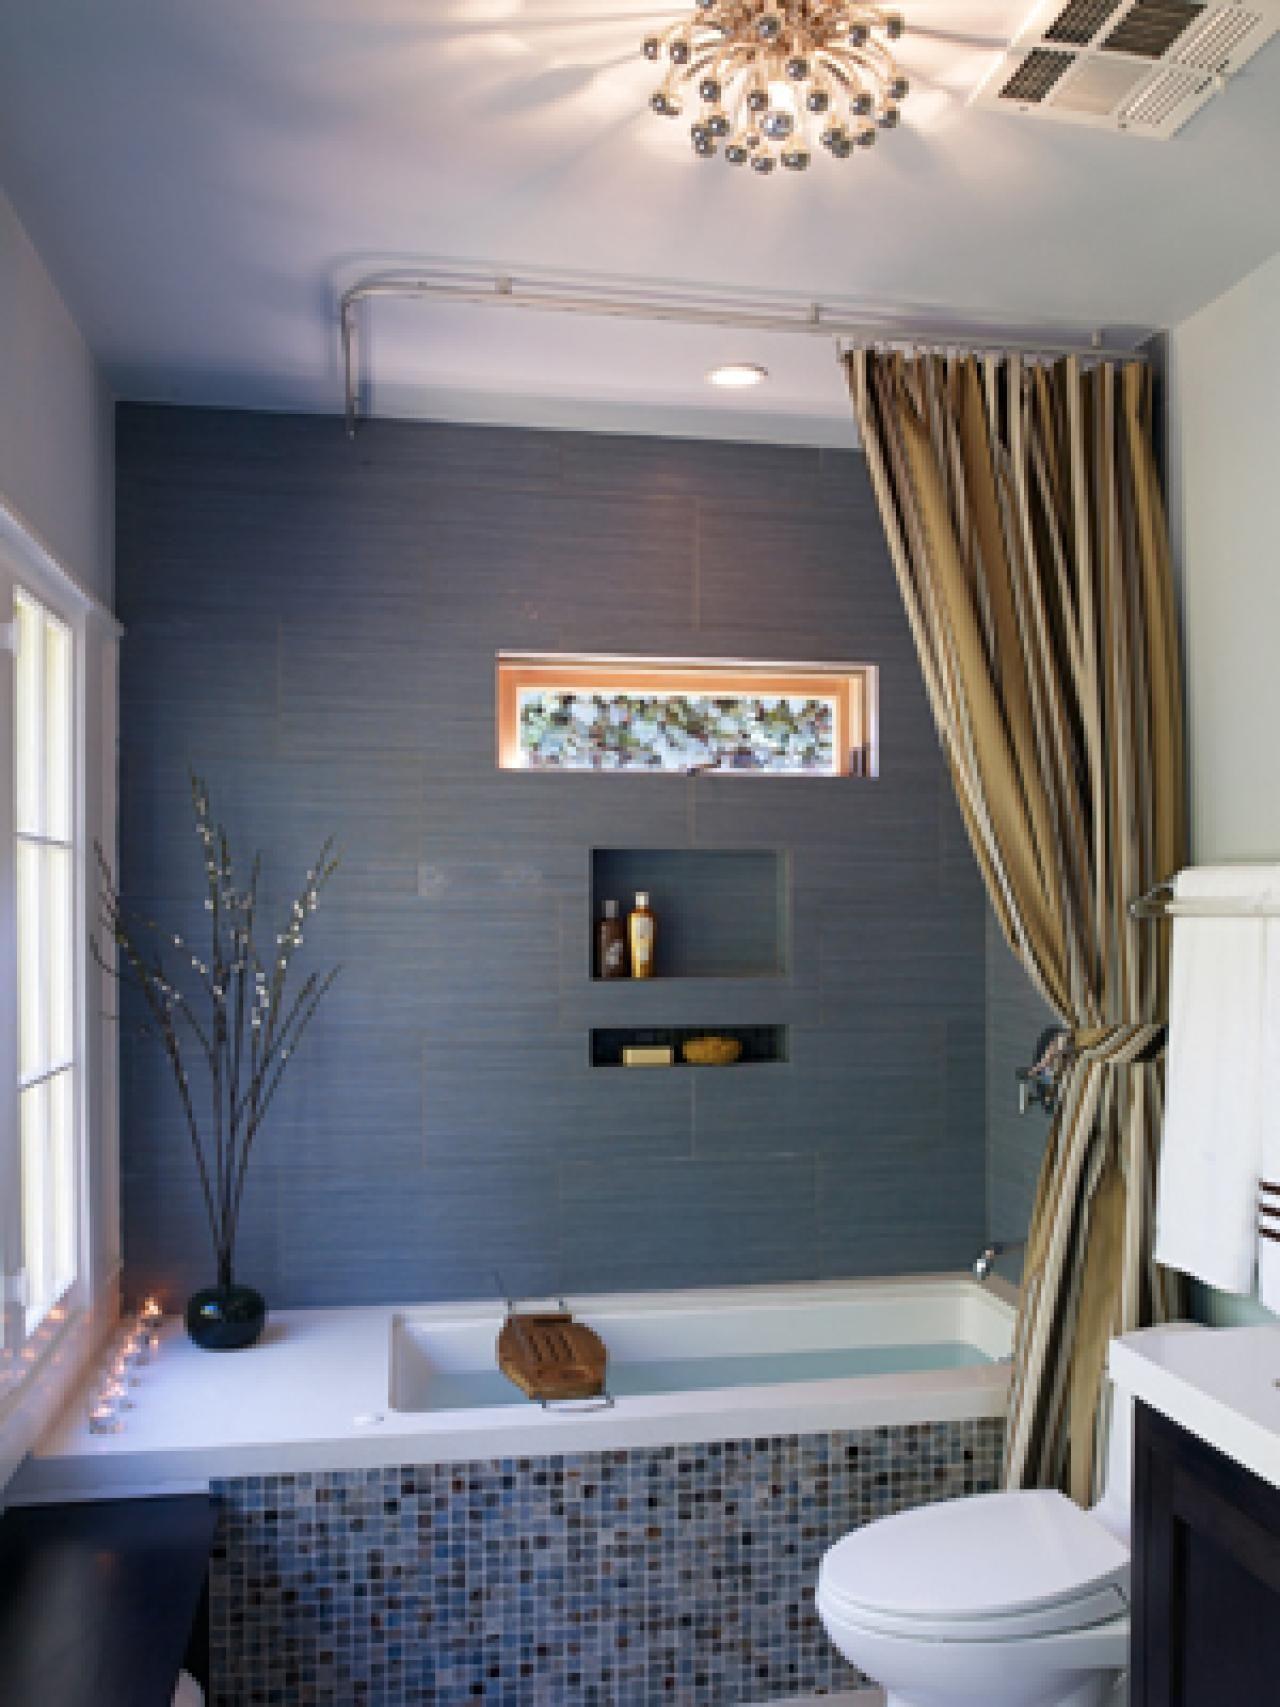 Bath under window ideas  tub enclosures  tub enclosures tubs and small bathroom designs